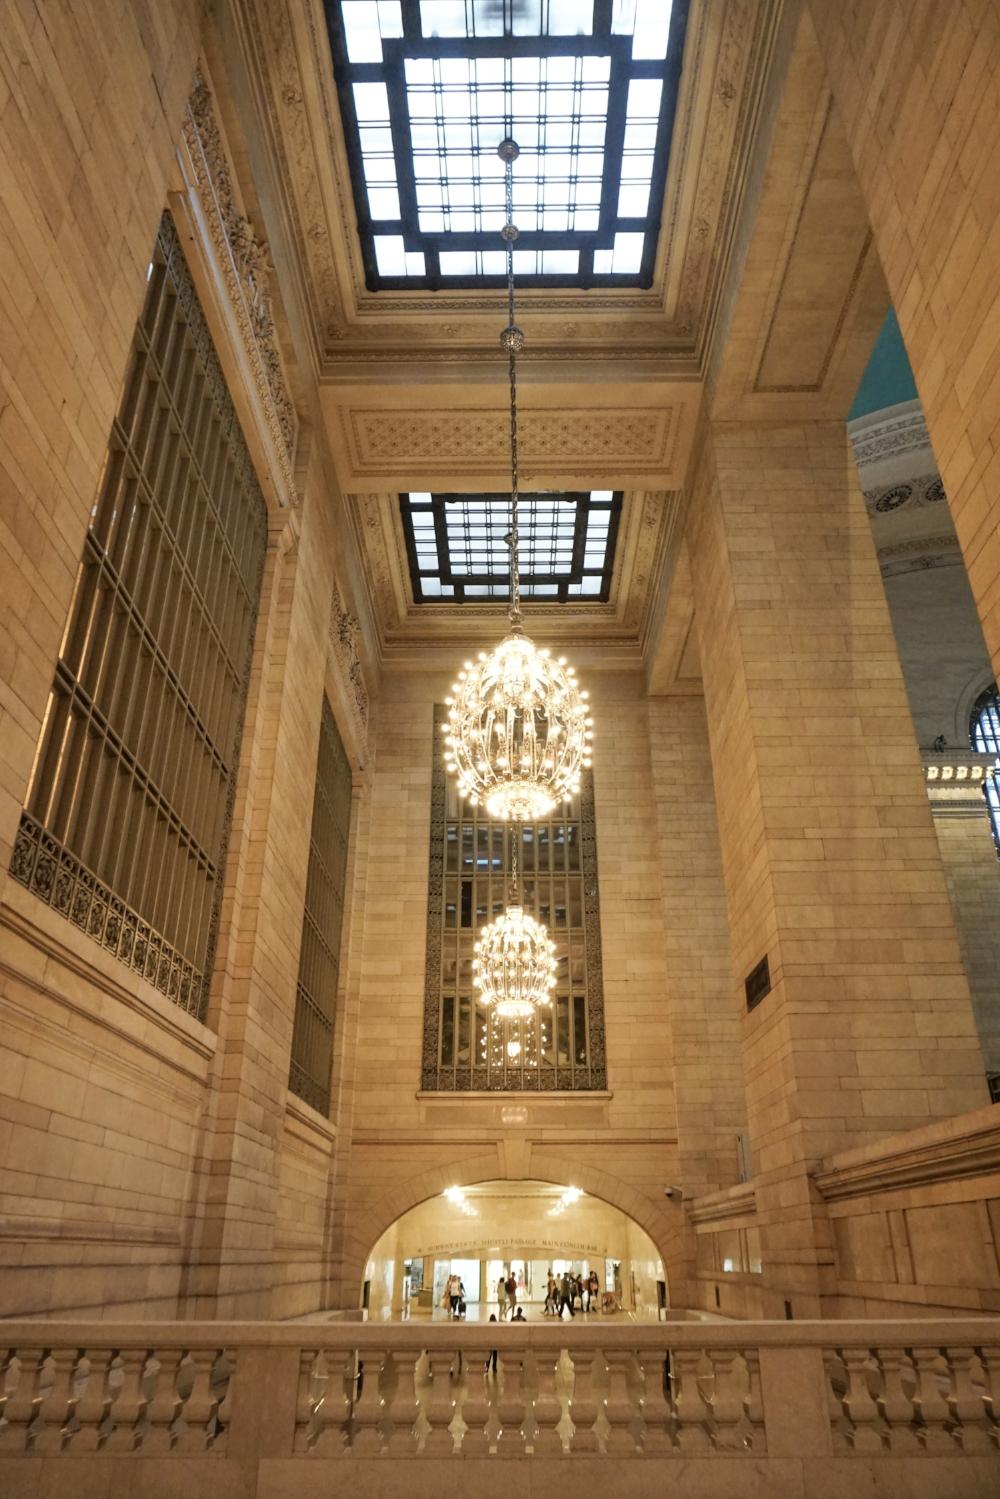 curio.trips.usa.nyc.grand.central.terminal.interior.jpg